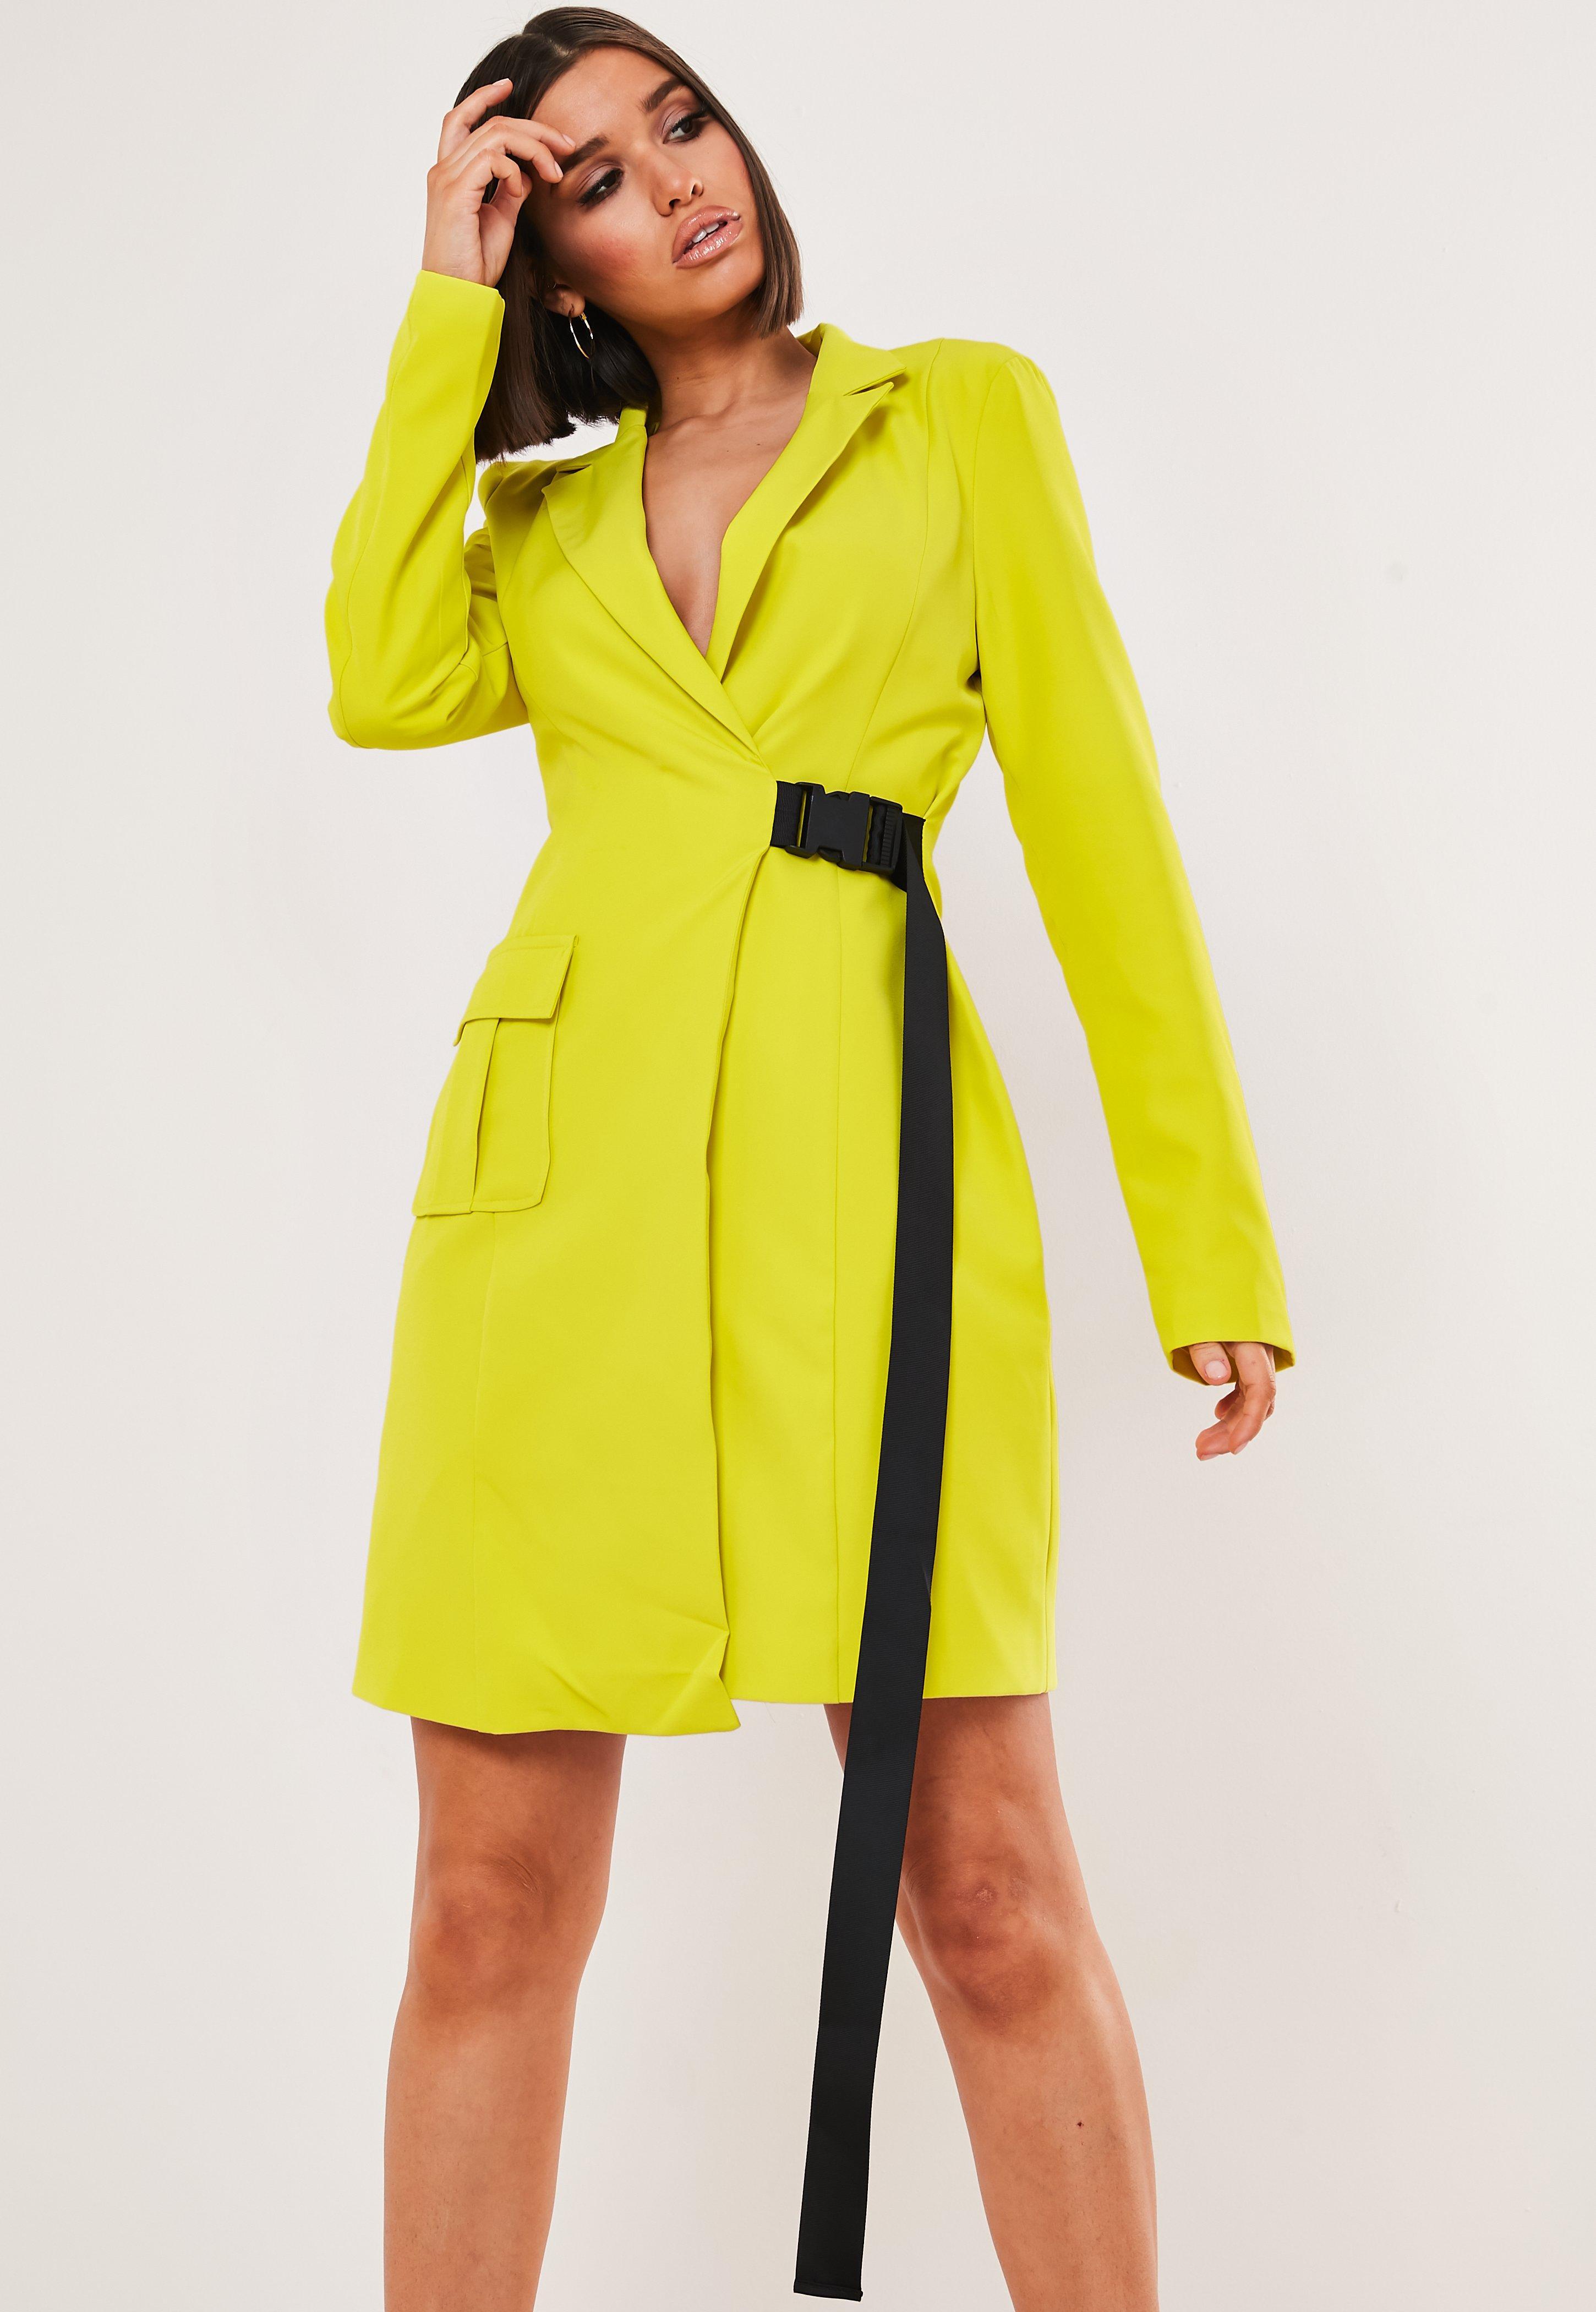 b9d23e4f427c Blazer Dresses | Shop Tuxedo Dresses - Missguided